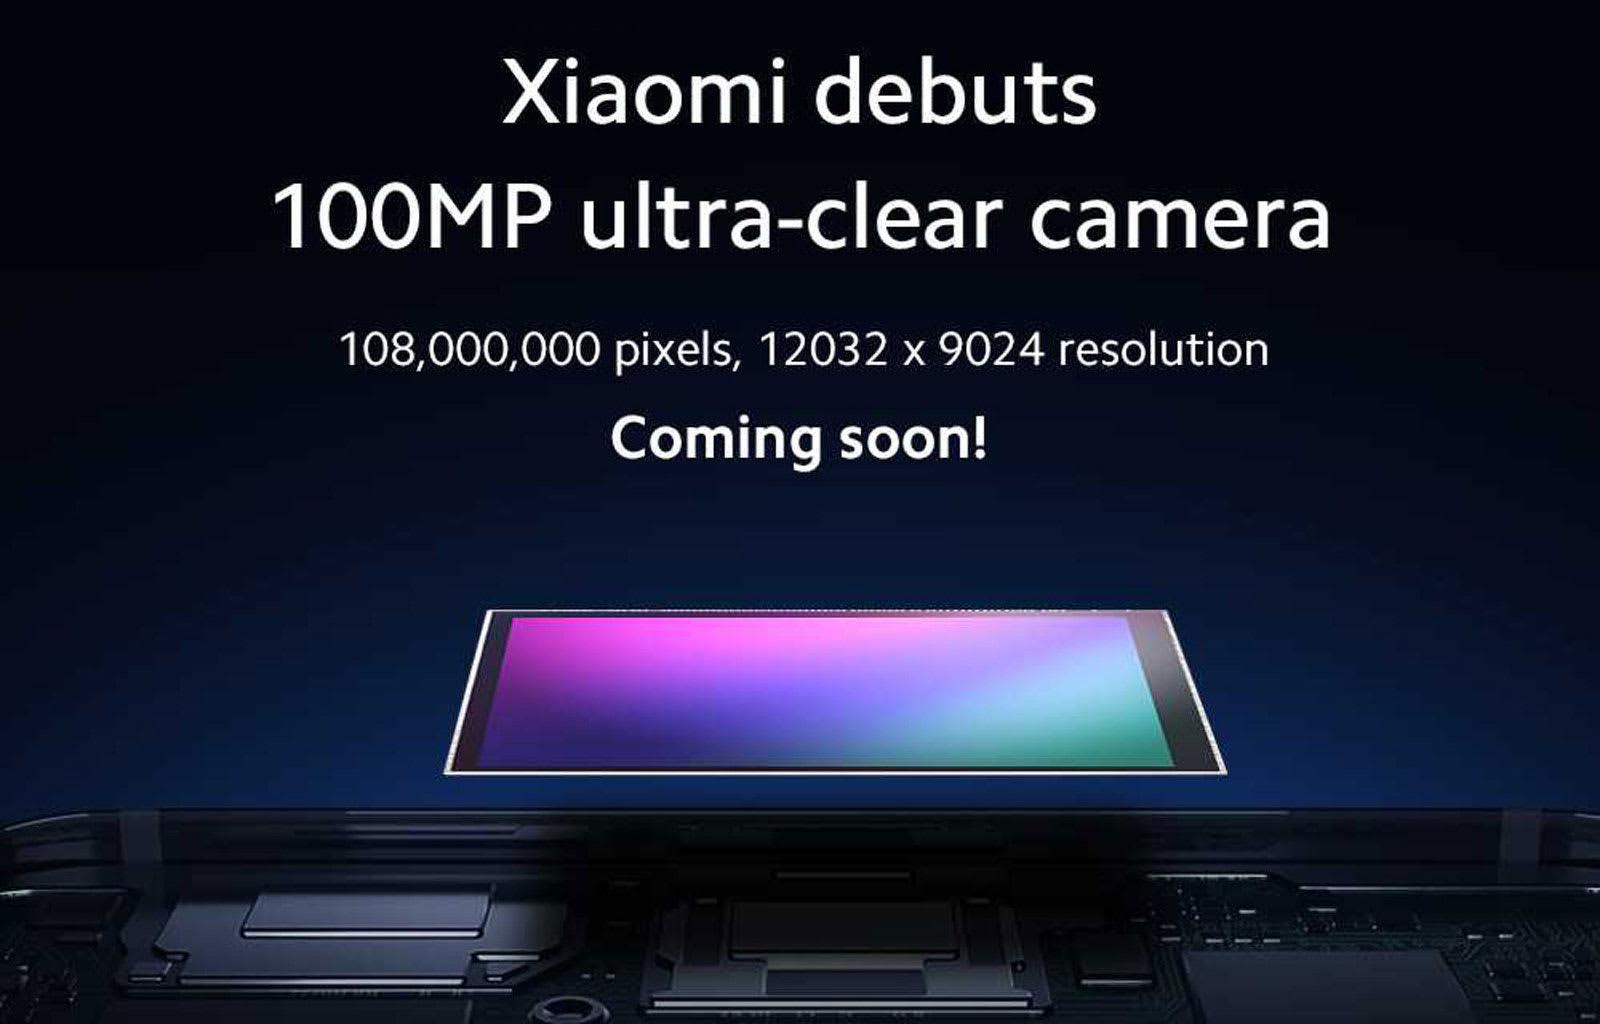 kamera ya simu ya megapixel mp 108 xiaomi